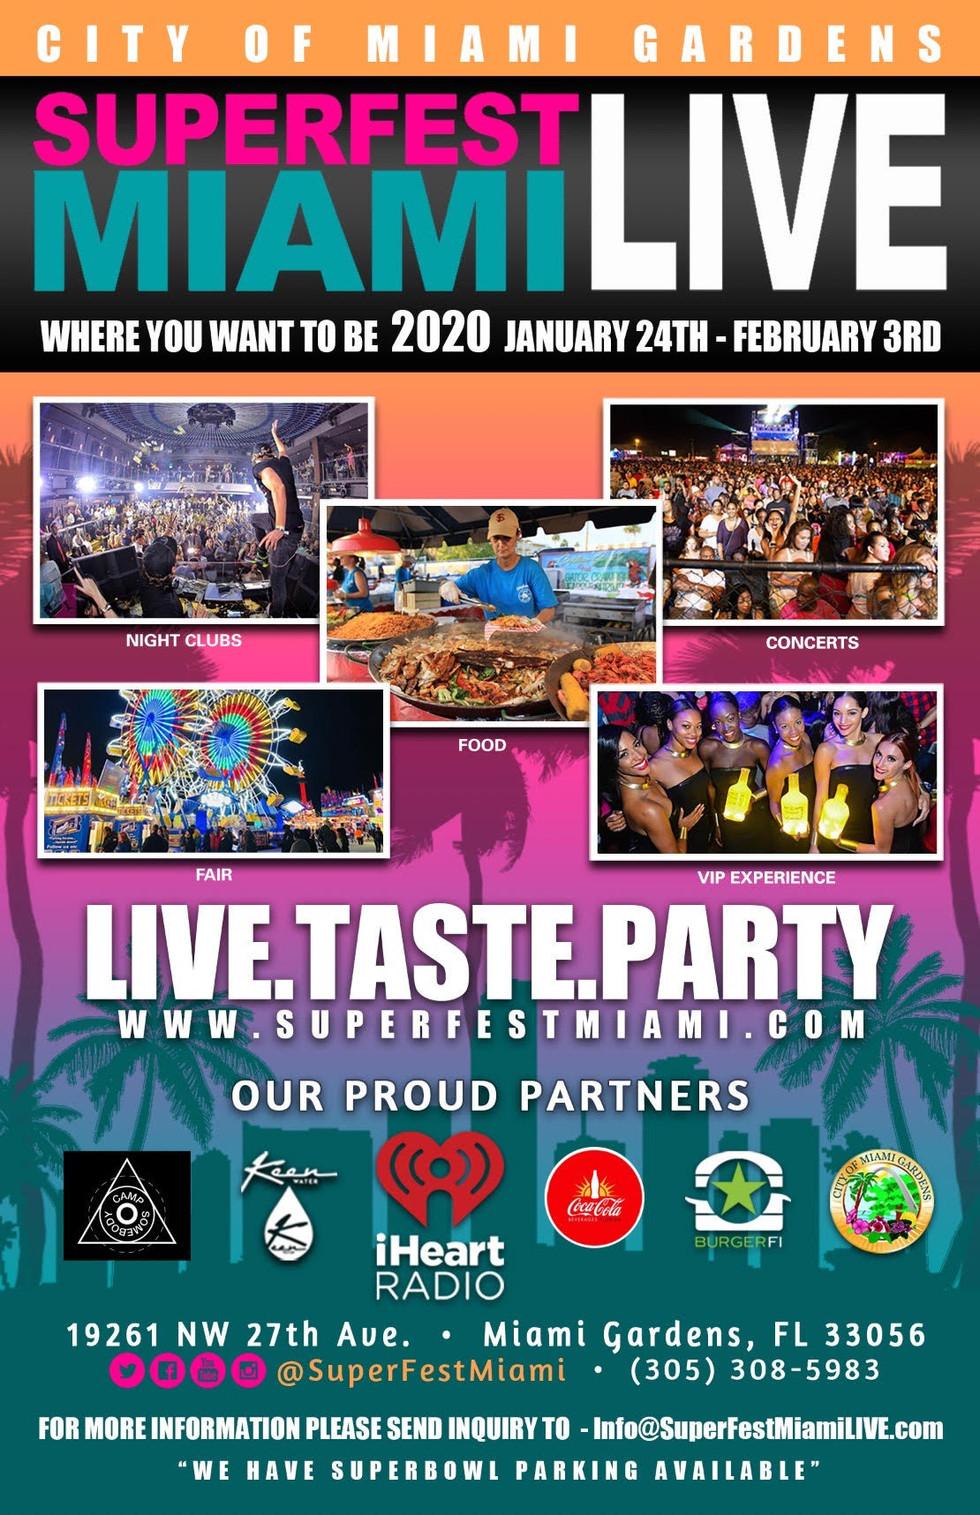 SuperFest Miami LIVE Enlists Chris Brown, Cardi B, Migos, Megan Thee Stallion & More